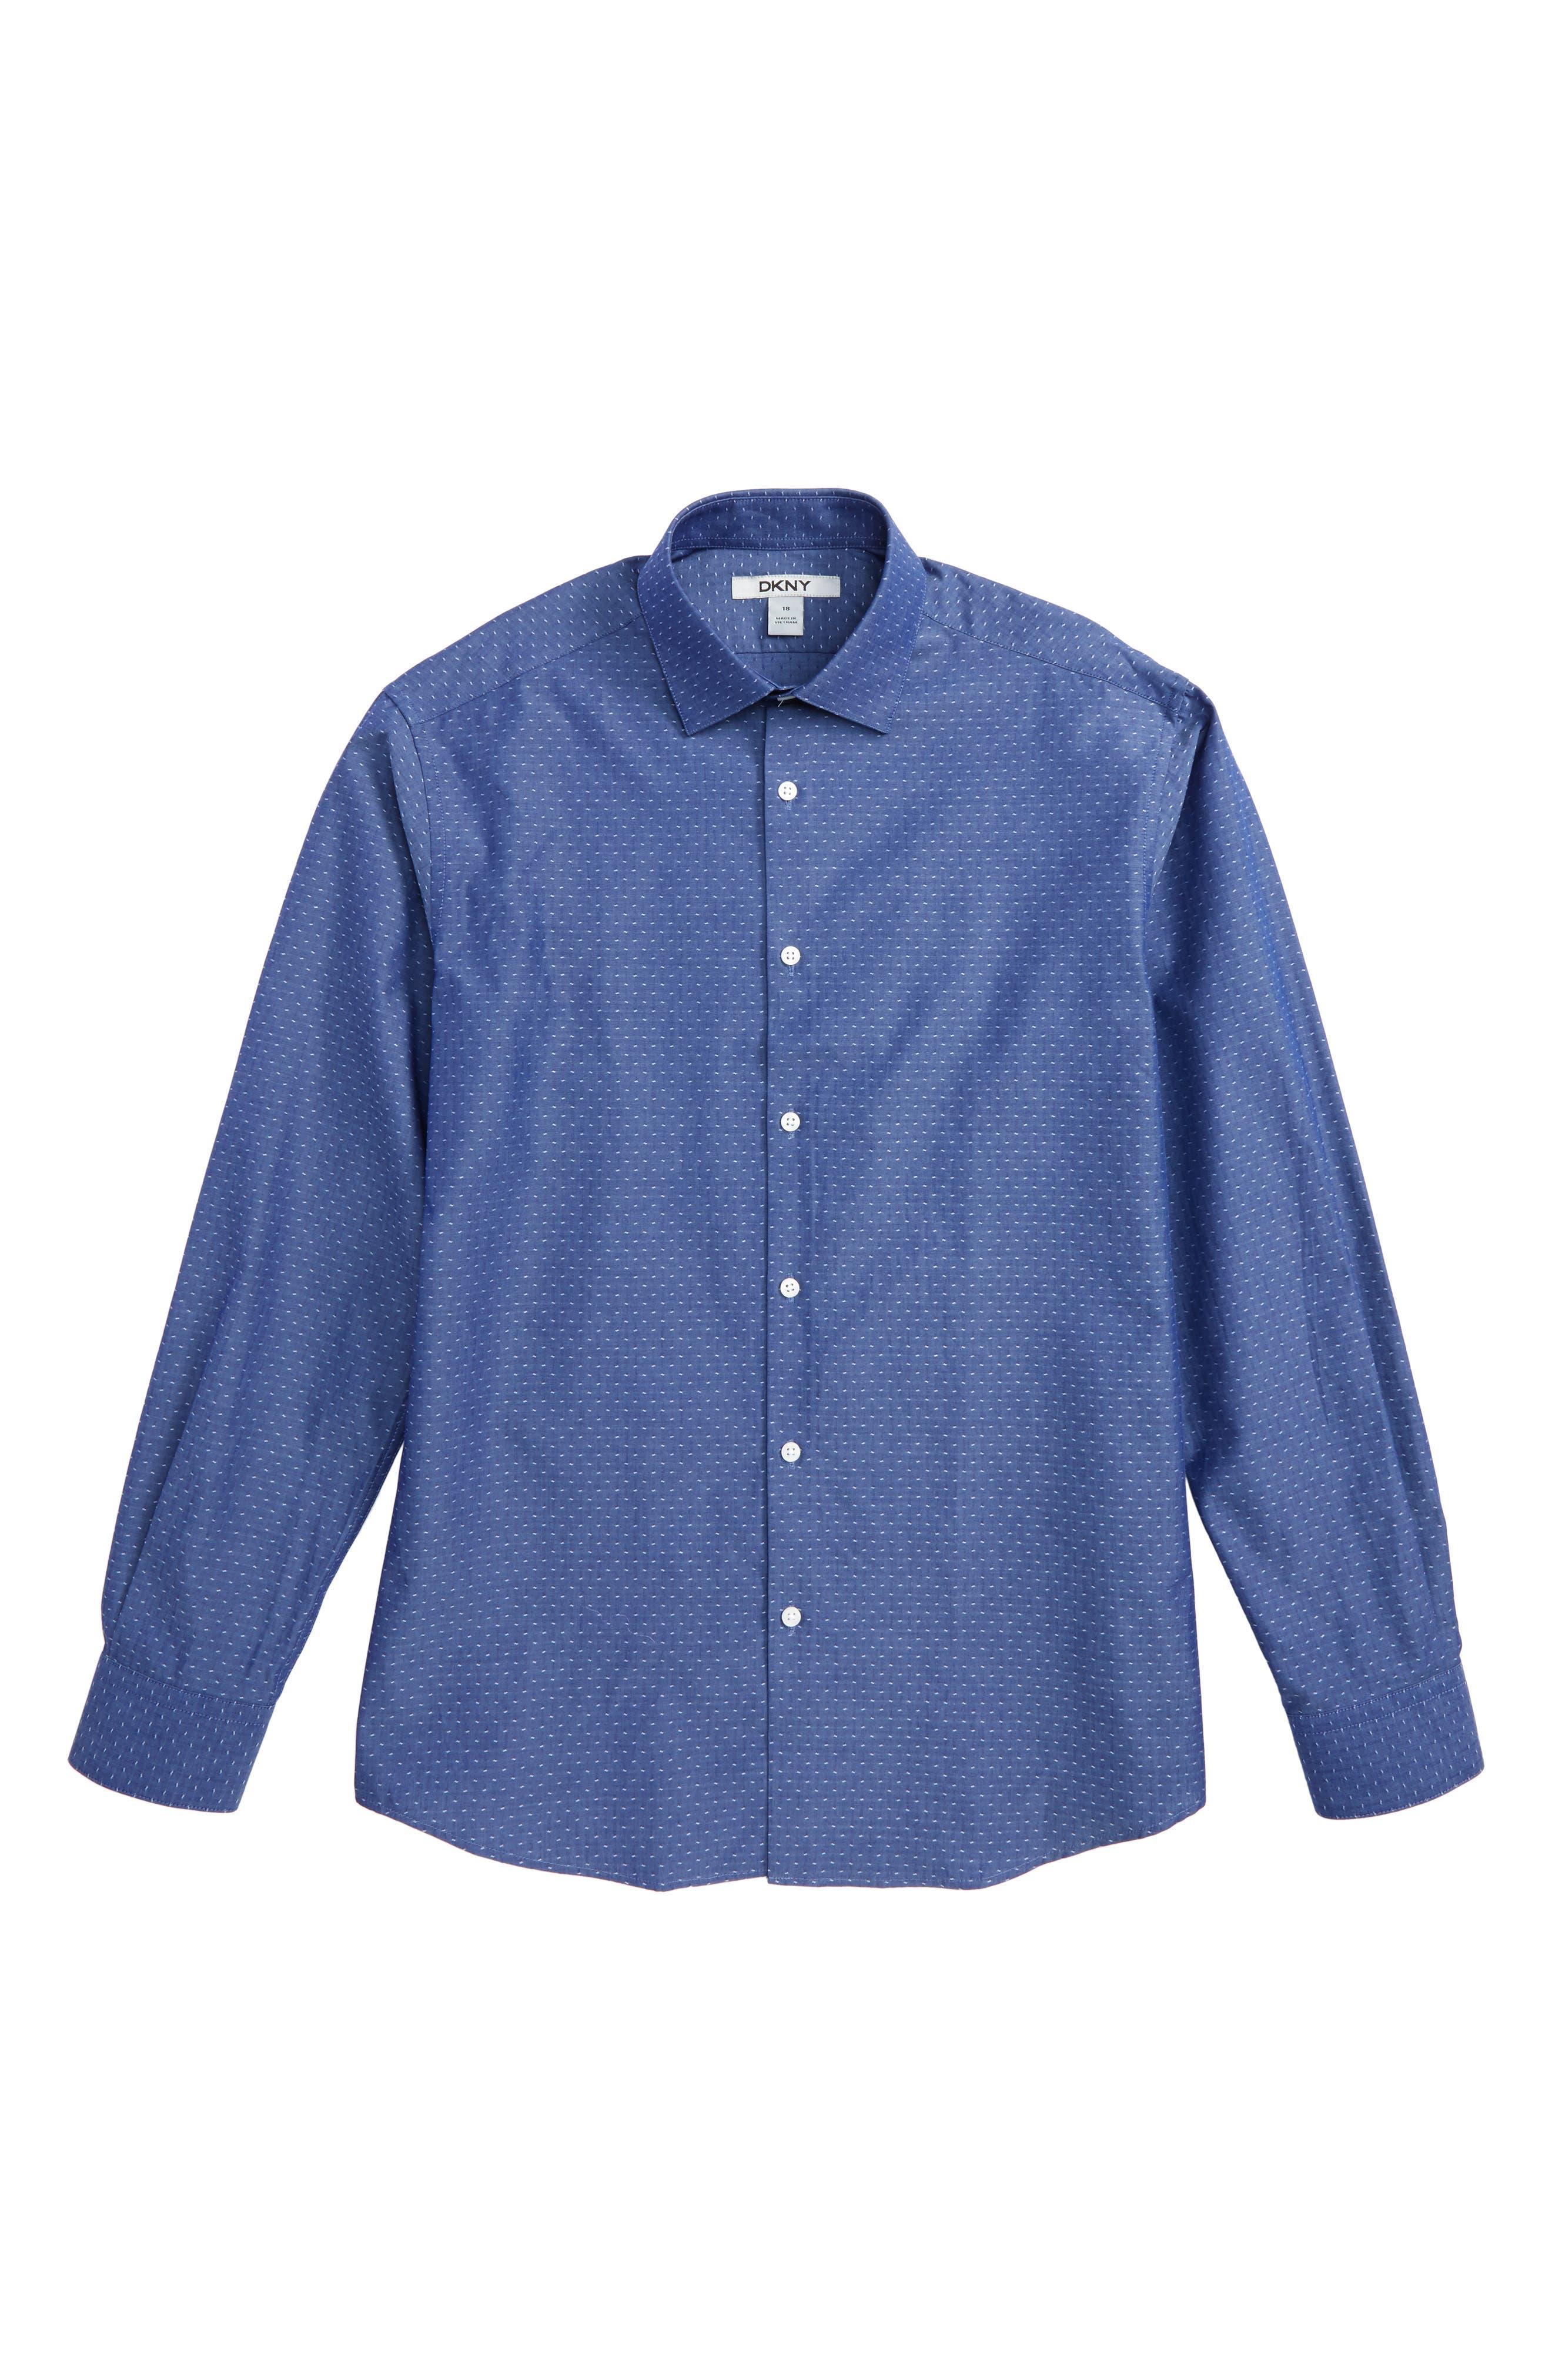 Dobby Dress Shirt,                             Main thumbnail 1, color,                             Blue